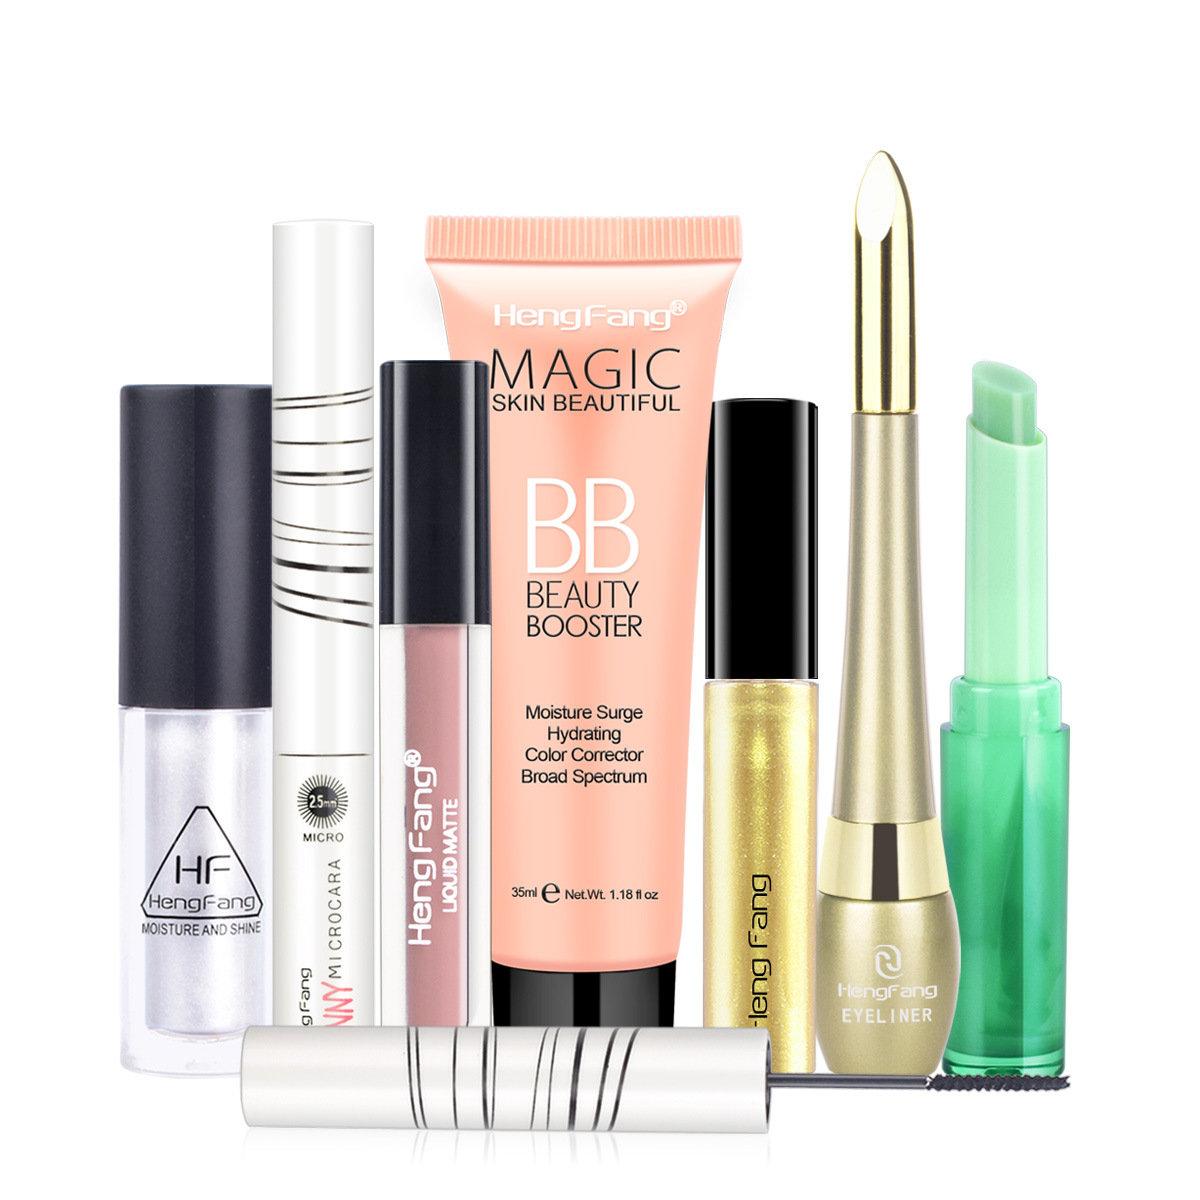 7Pcs Lipstick Makeup Set Lasting Lip Gloss Mascara Eyeliner BB Cream Kit Waterproof Makeup Kit